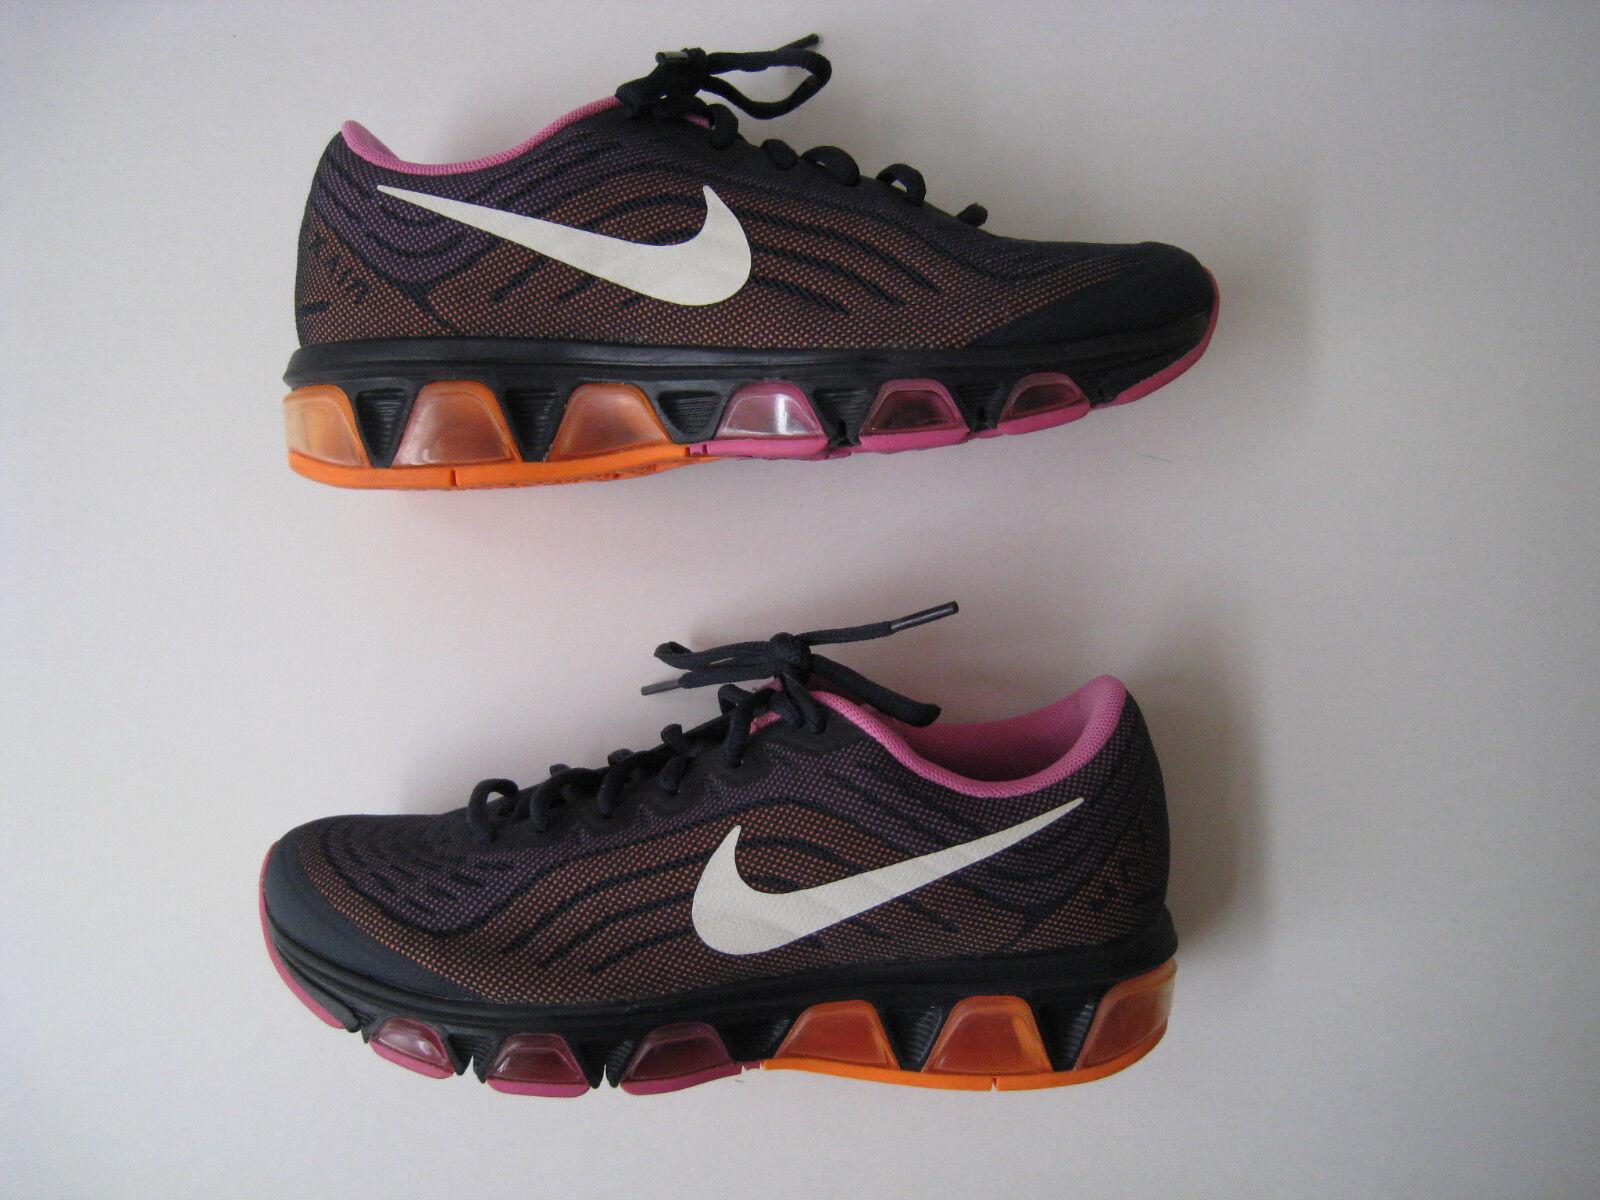 NIKE MAXAIR TAILWIND 6 MAXAIR NIKE RUNNING Chaussures femmes  US 7 EUR 38 PURPLE rose 621226-415 HOT cd403e